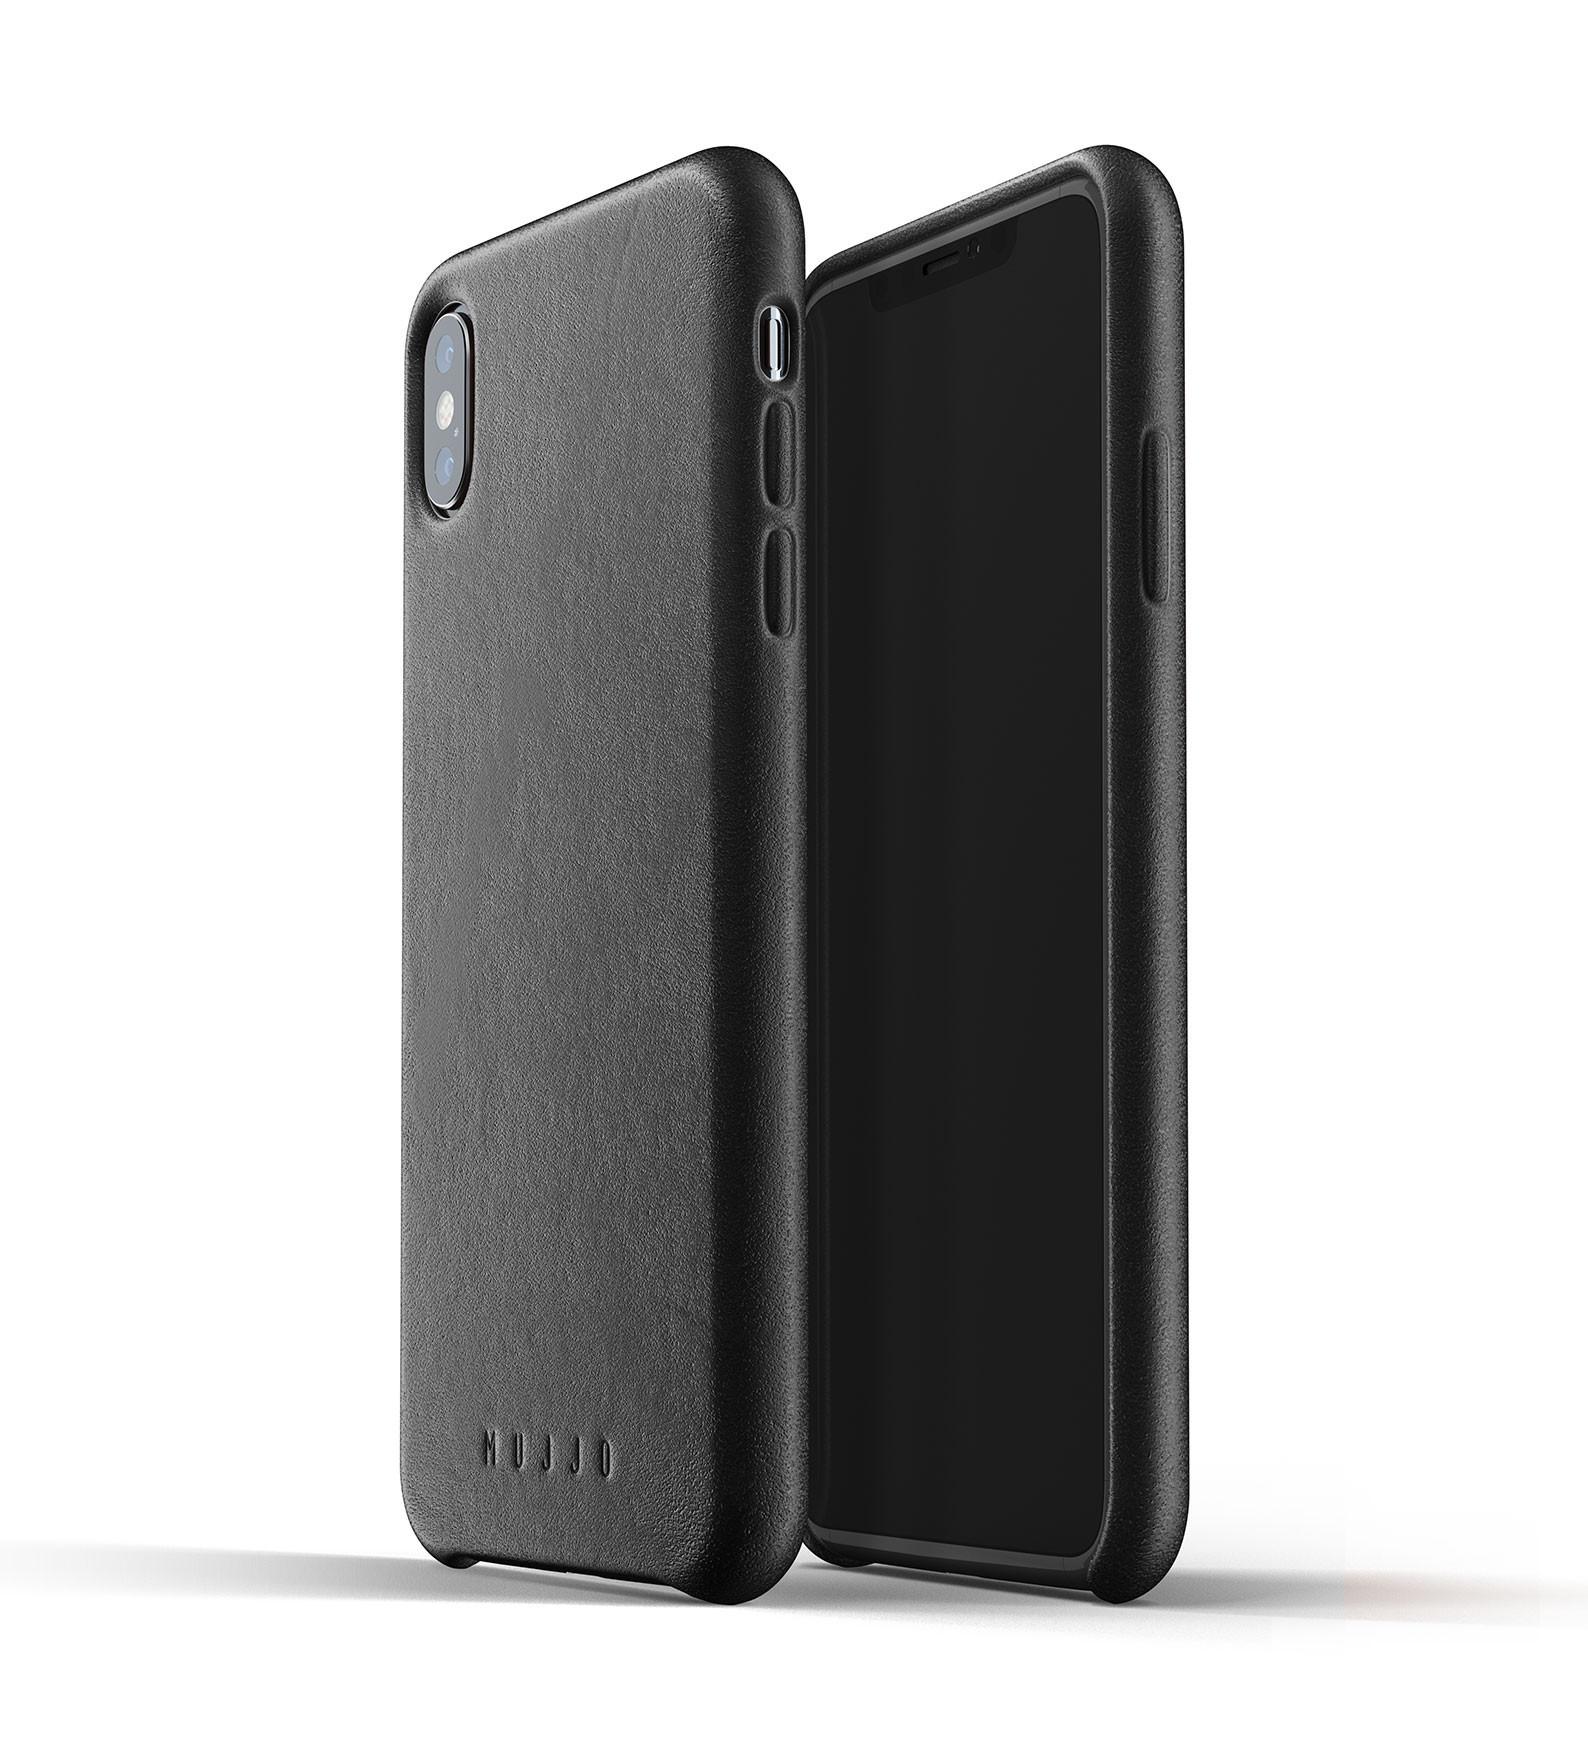 MUJJO Full Leather Case - Δερμάτινη Θήκη iPhone XS Max - Black (MUJJO-CS-103-BK)